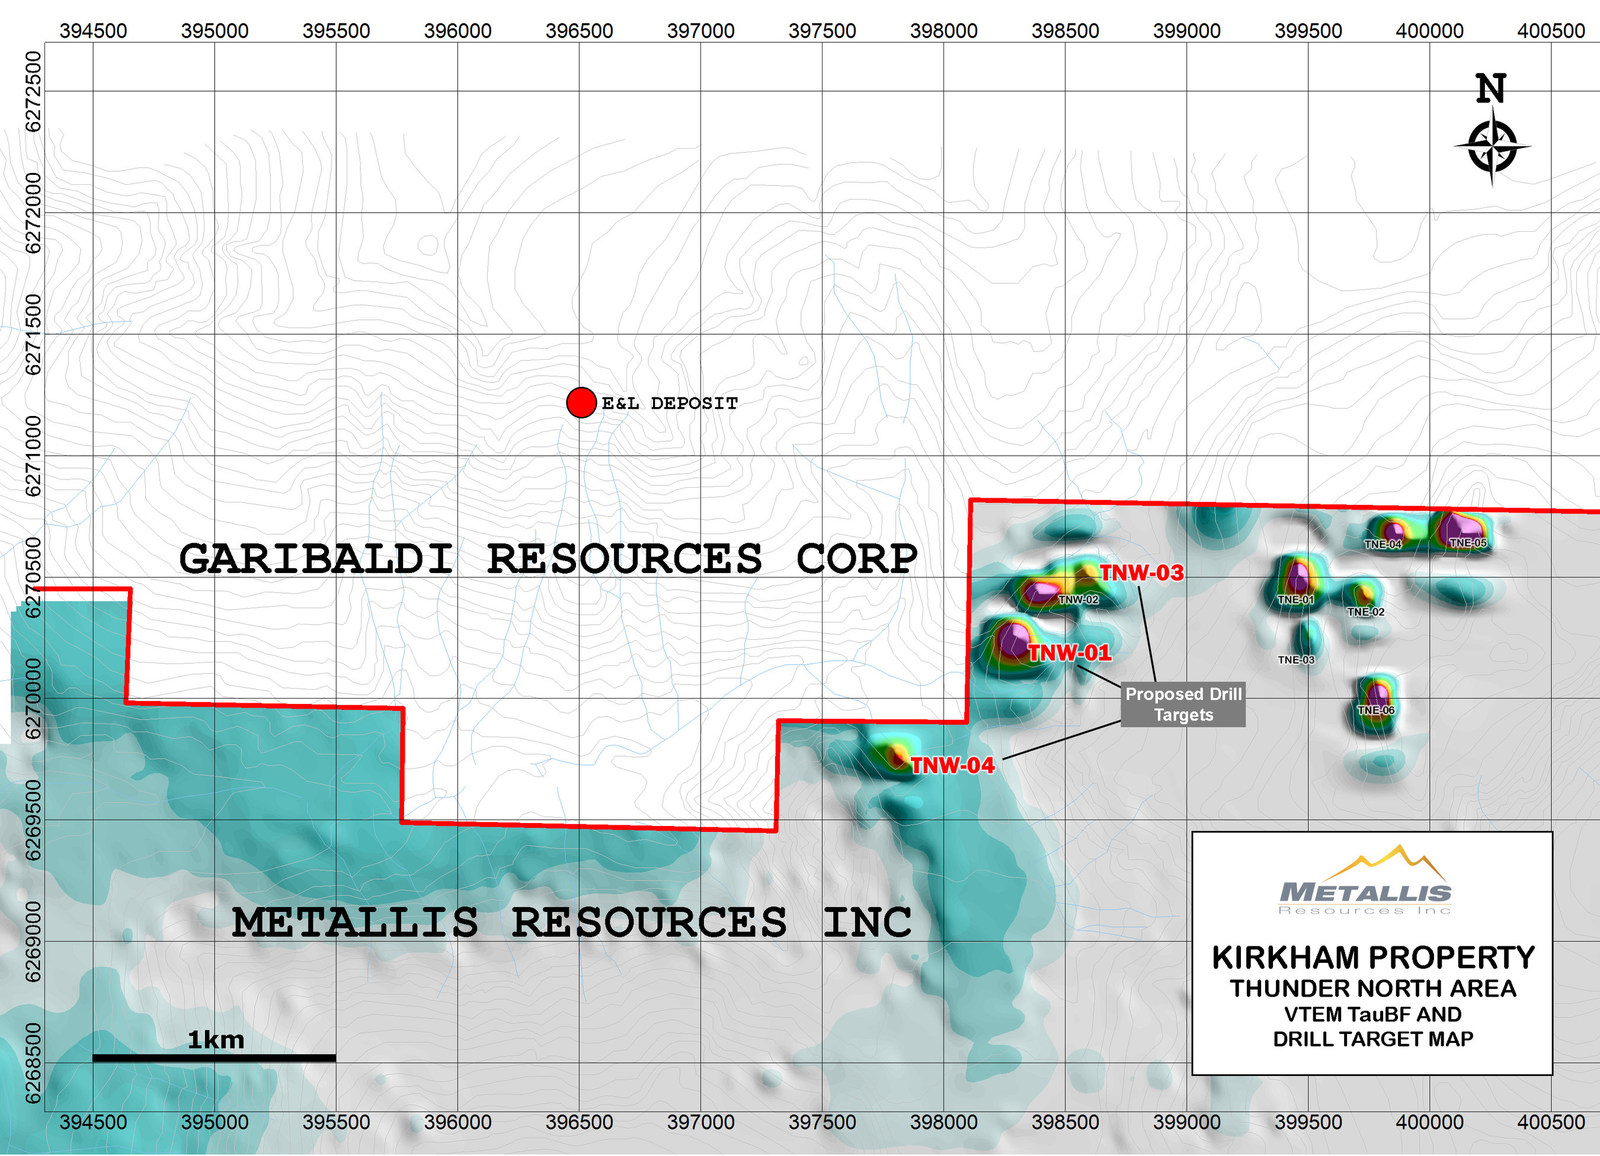 Metallis Resources Inc Kirkham Property  Thunder North Area  VTEM TauBF and Drill Target Map